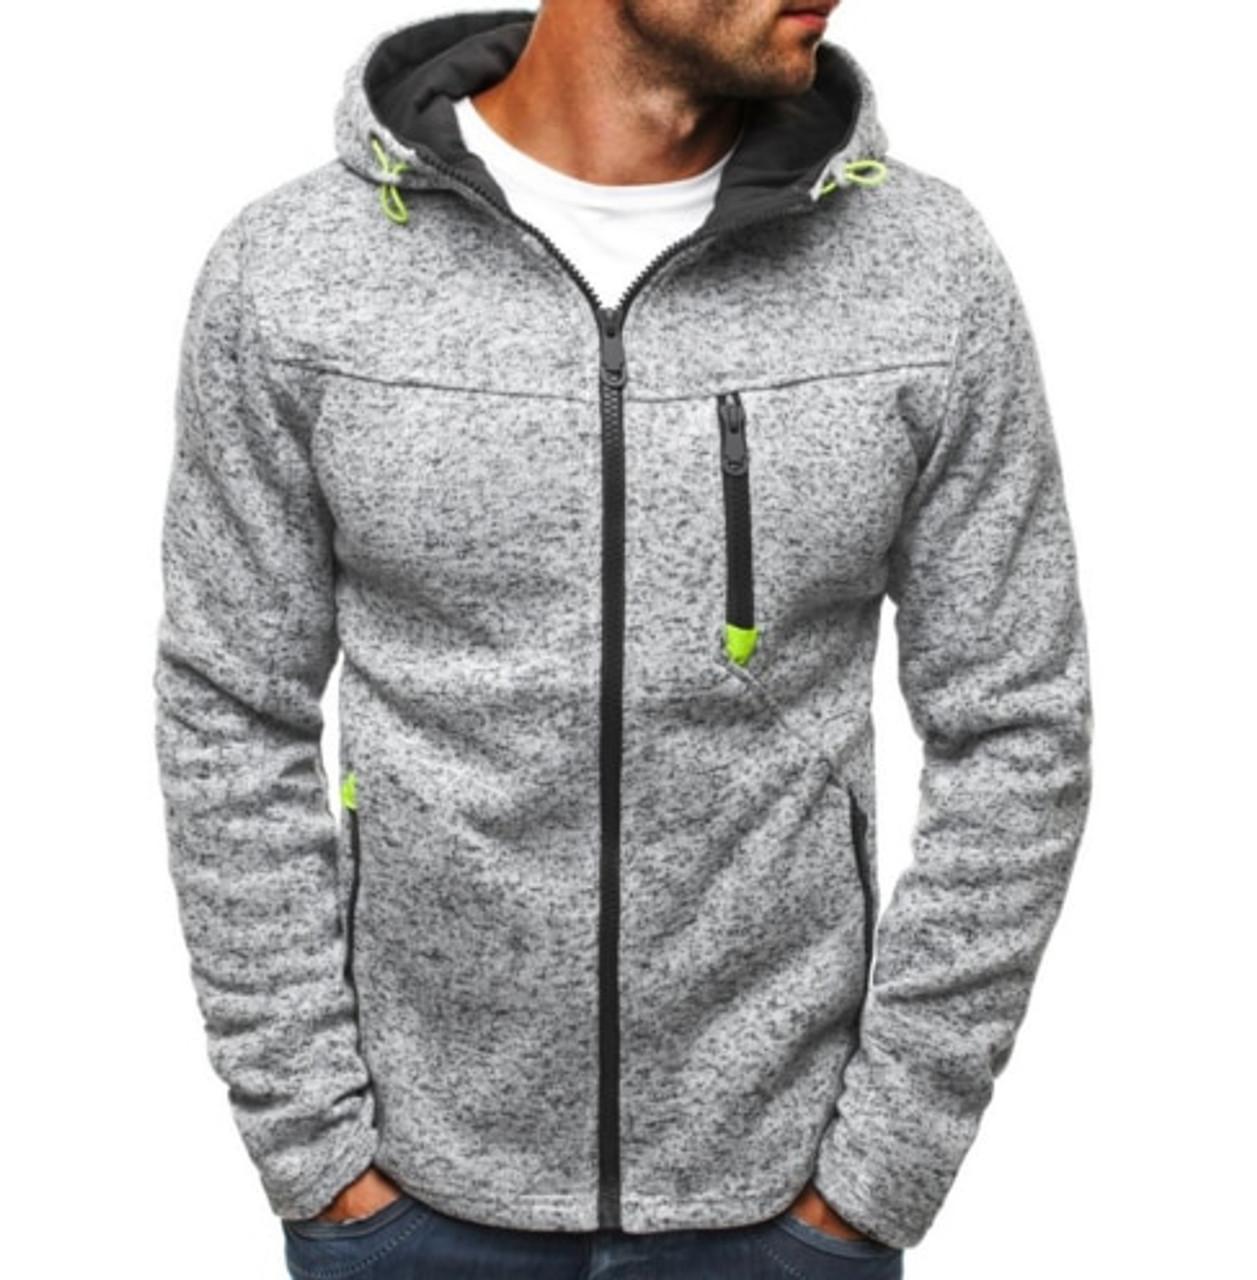 Hoodies & Sweatshirts Haifux Brand 2018 Cardigan Multi Button Hoodies Men Fashion Tracksuit Male Sweatshirt Mens Purpose Tour 4xl